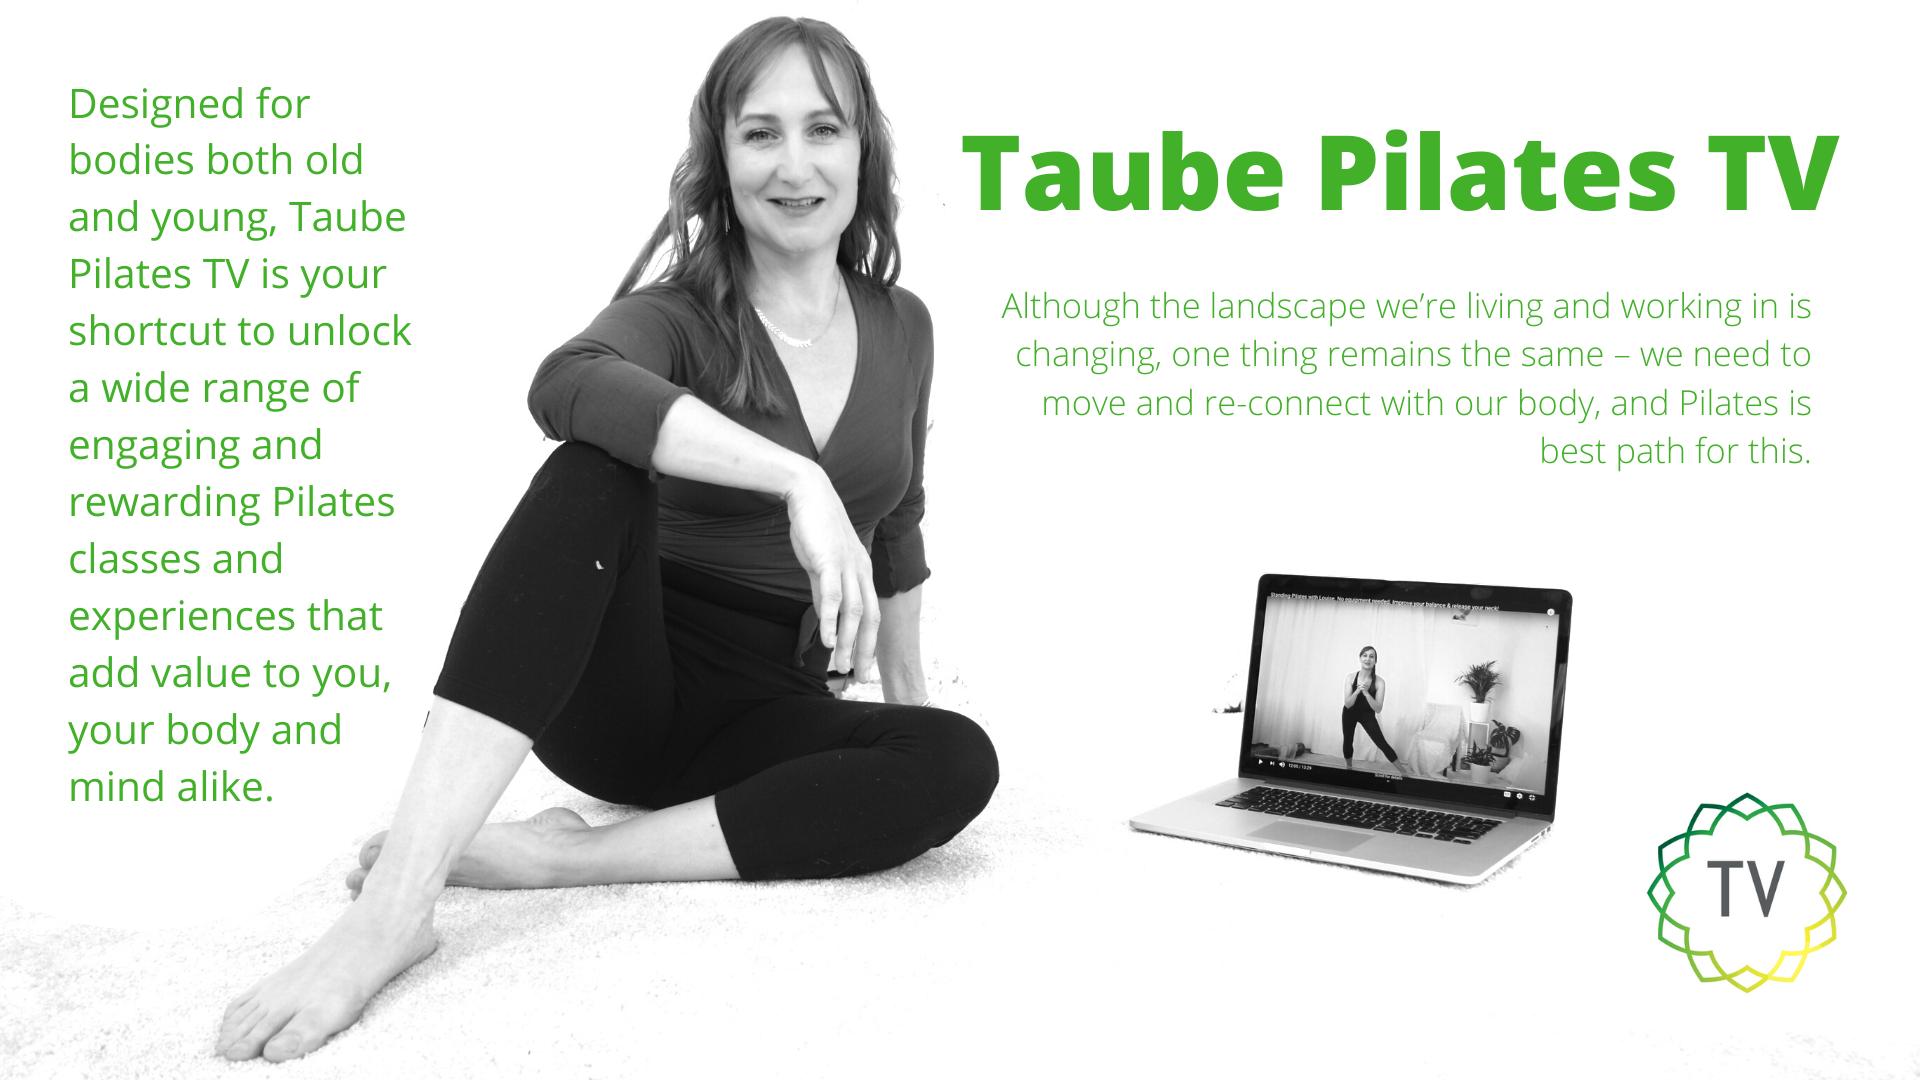 Taube Pilates TV